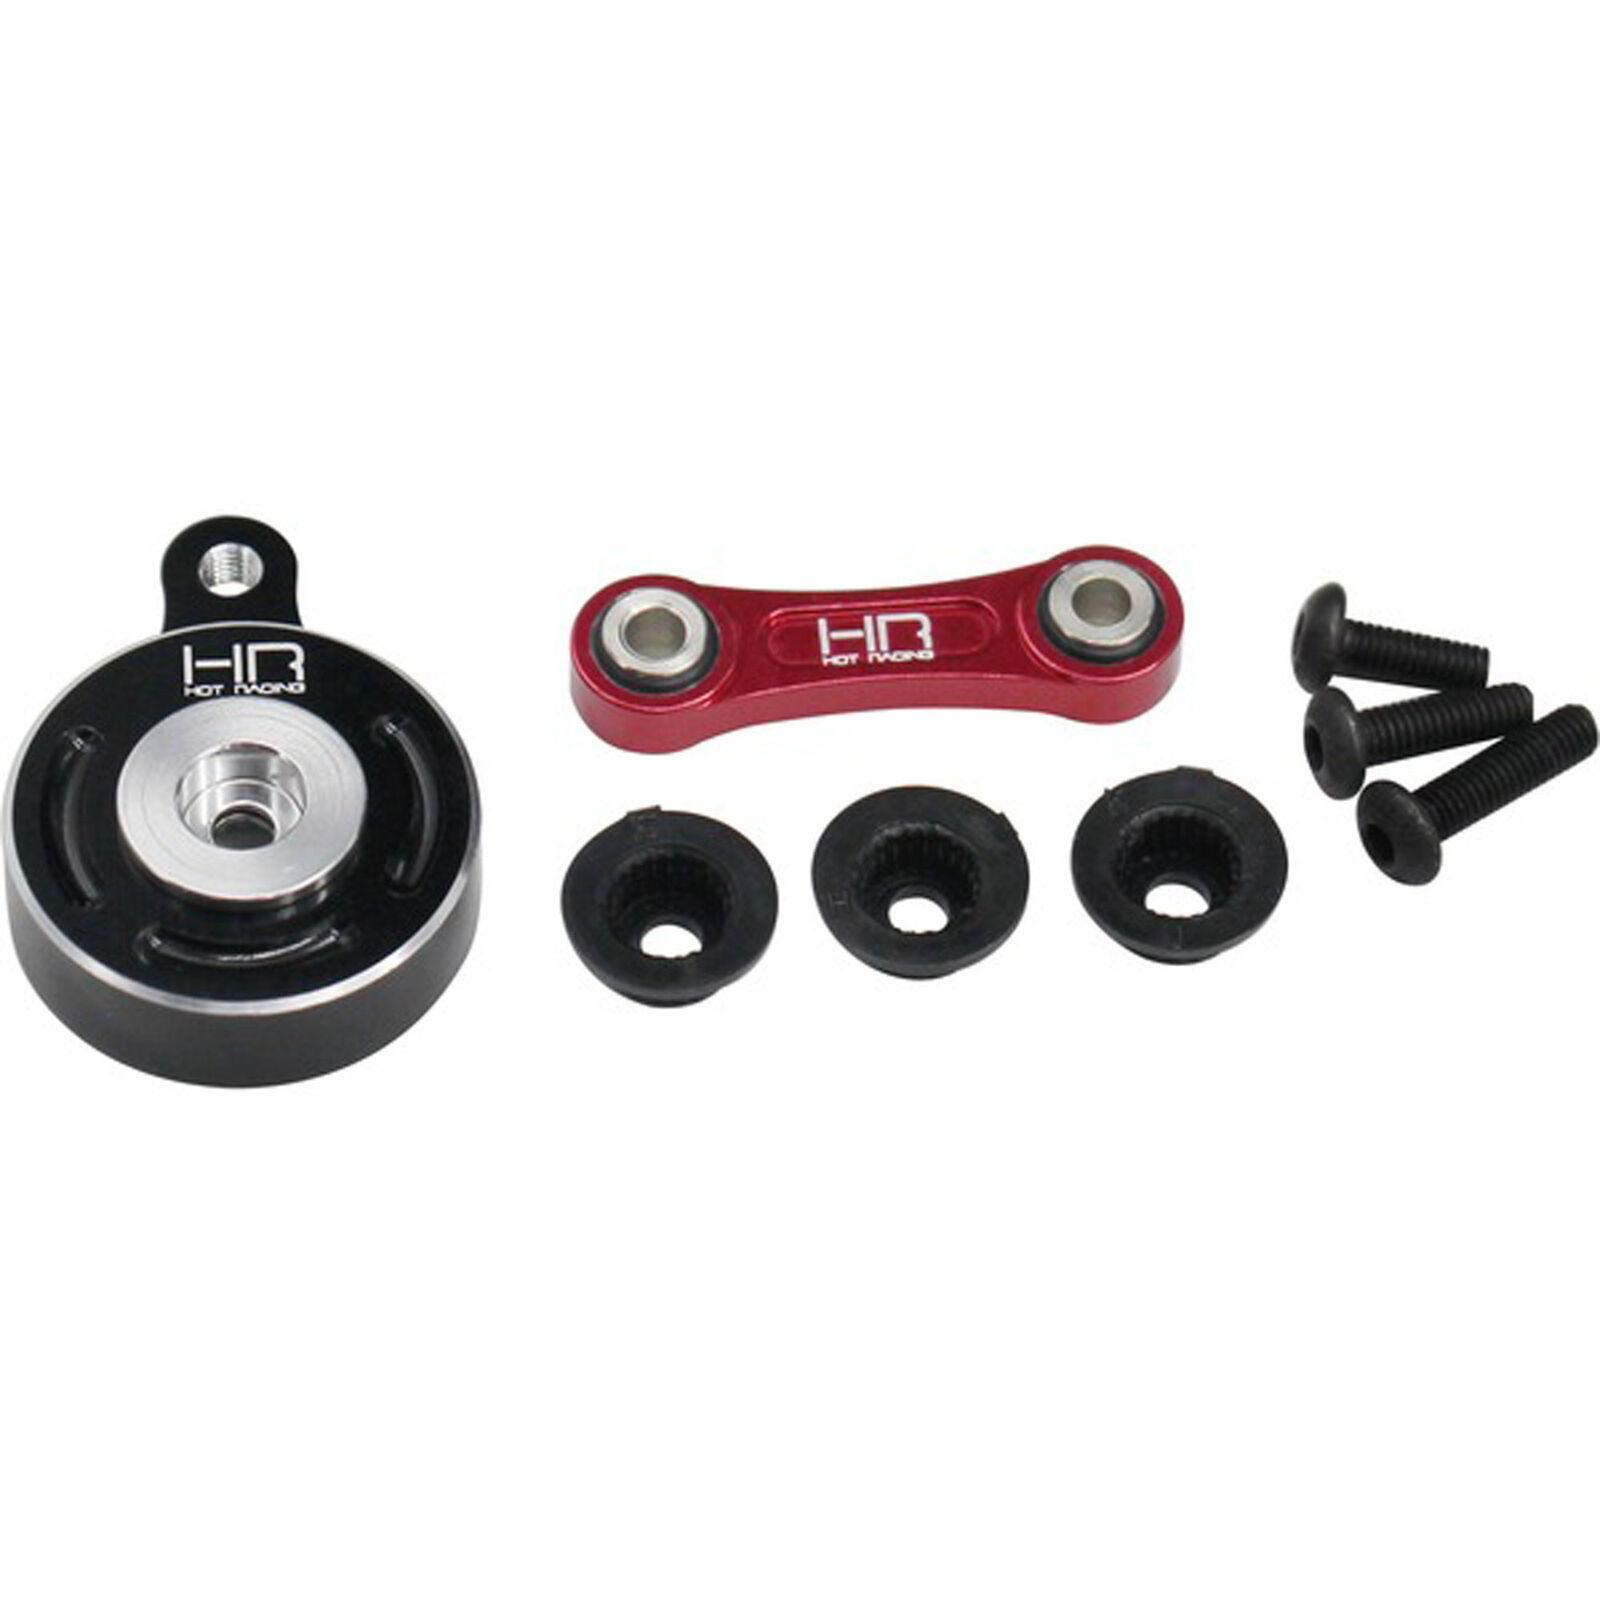 Fixed Link Steering Servo saver: ARRMA 1/10 4WD